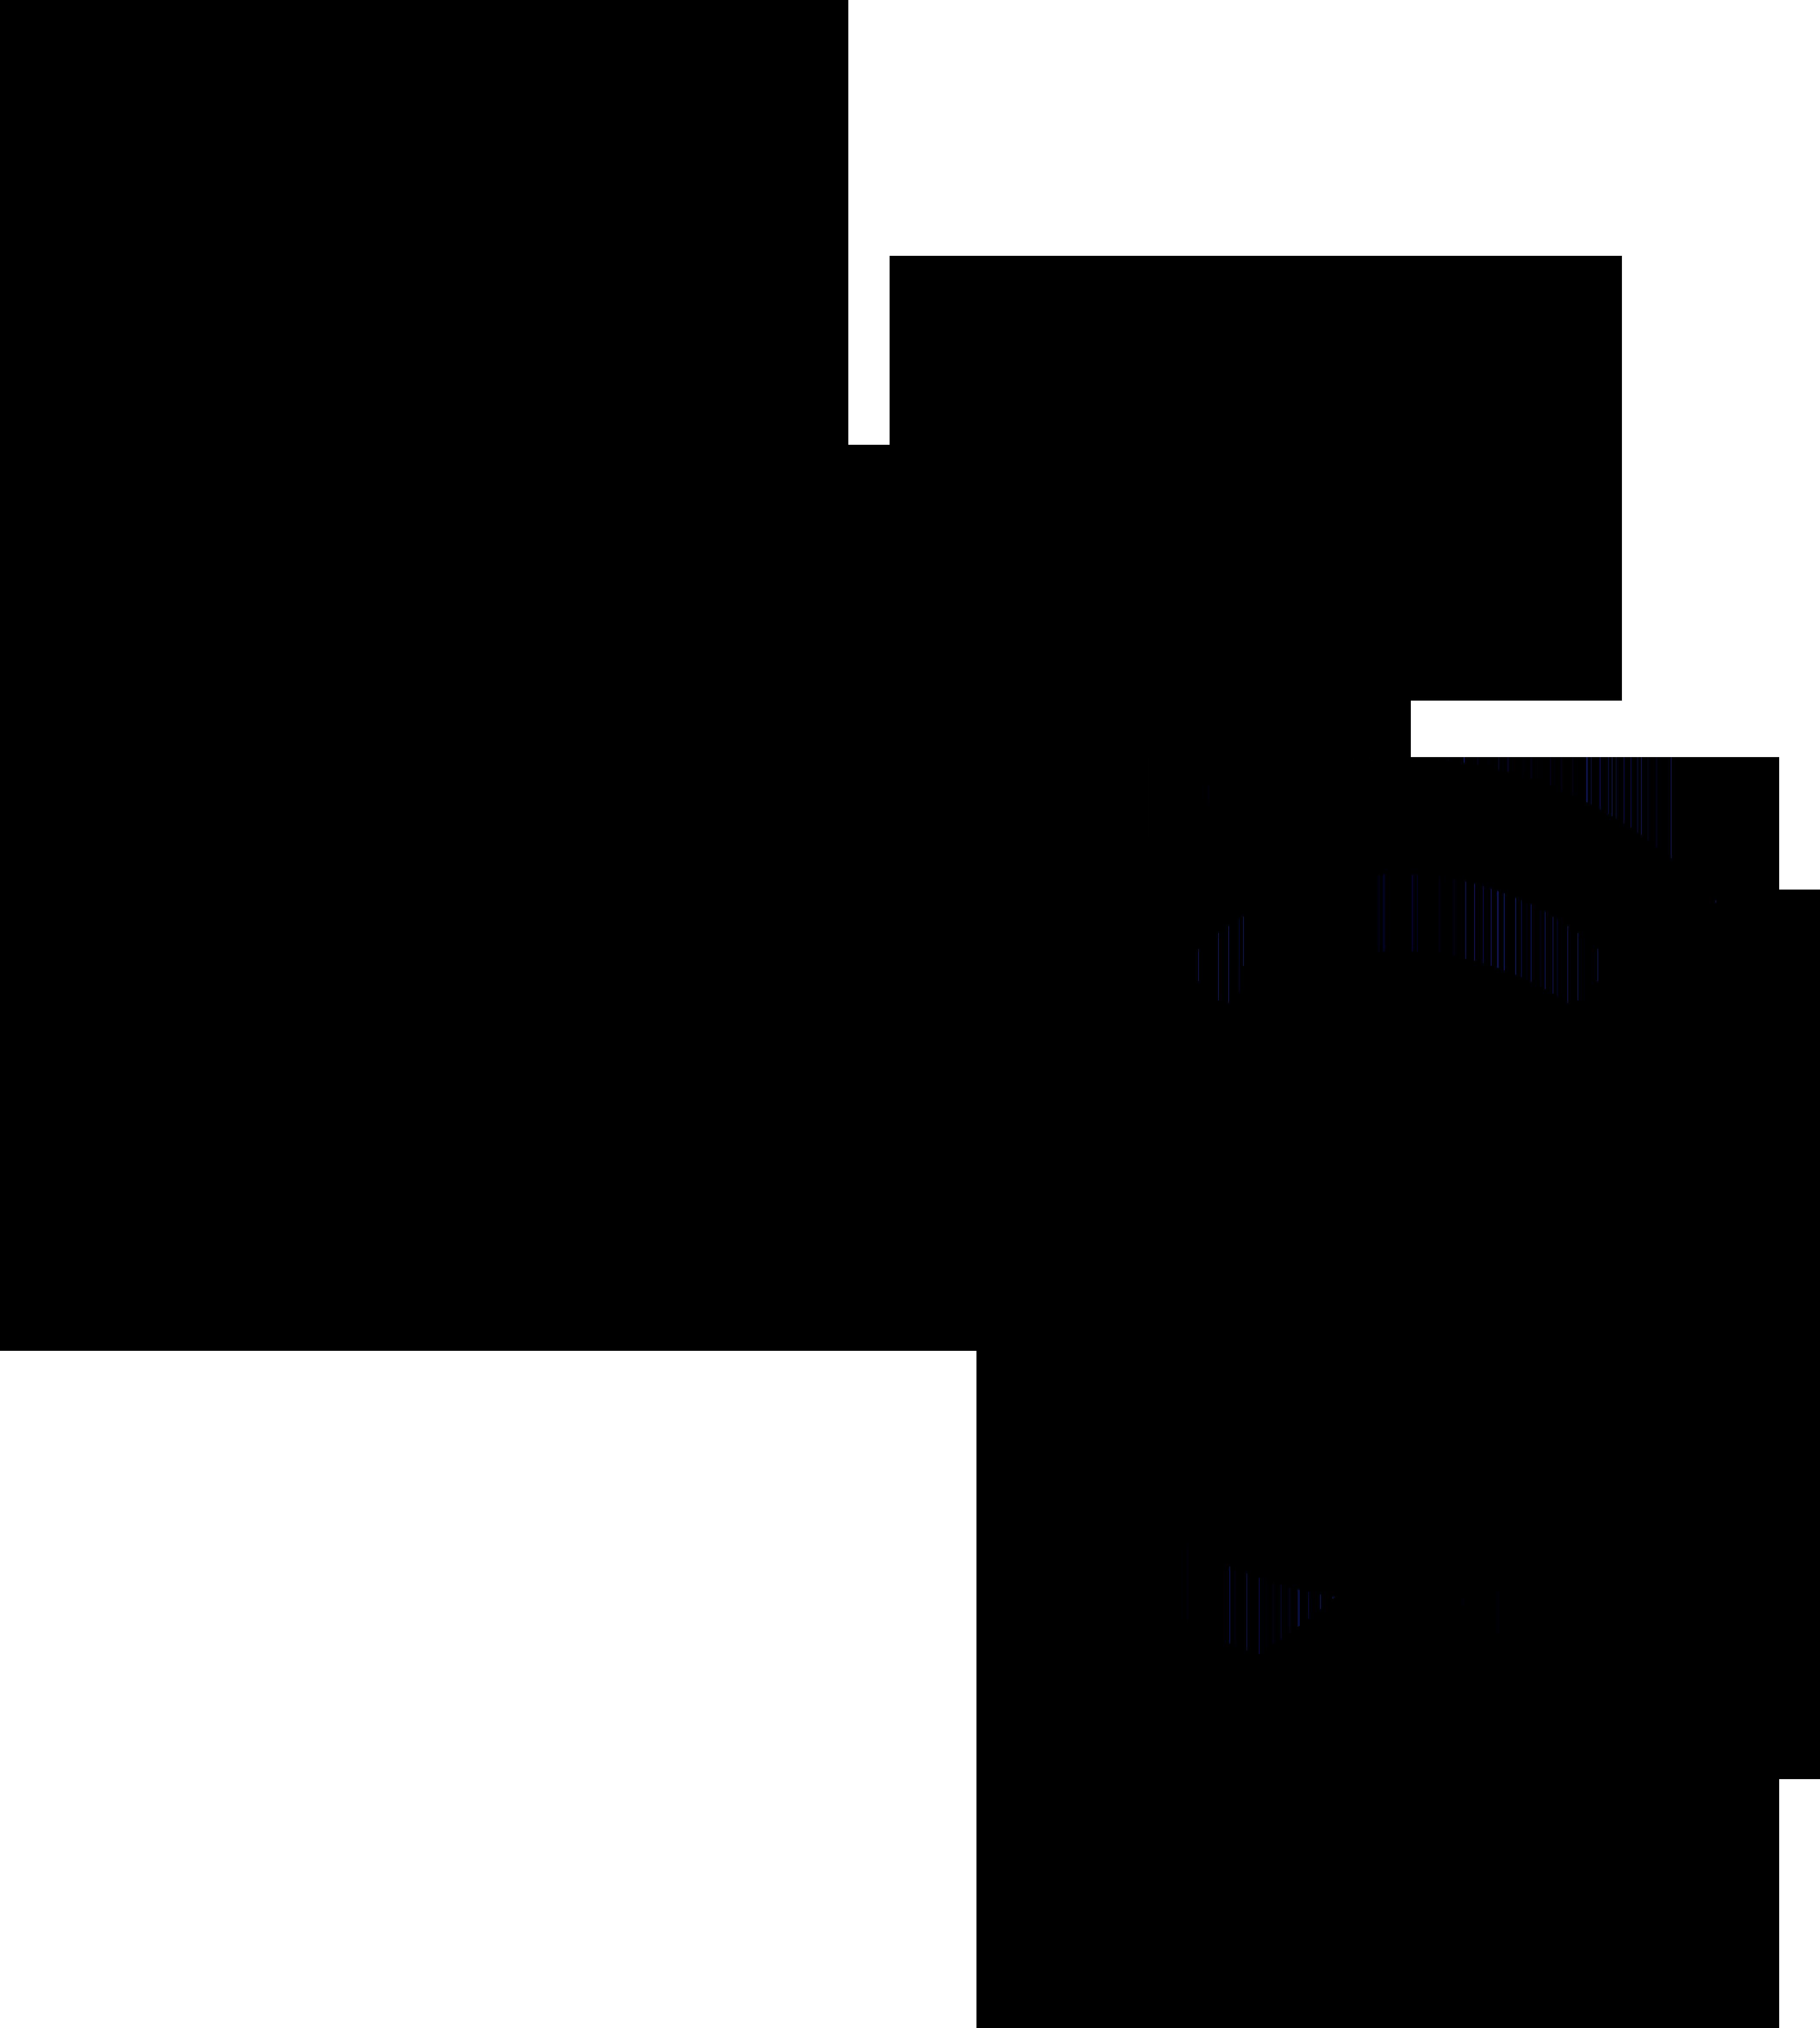 Mars symbol interlocked with a nonbinary symbol and a Venus symbol.